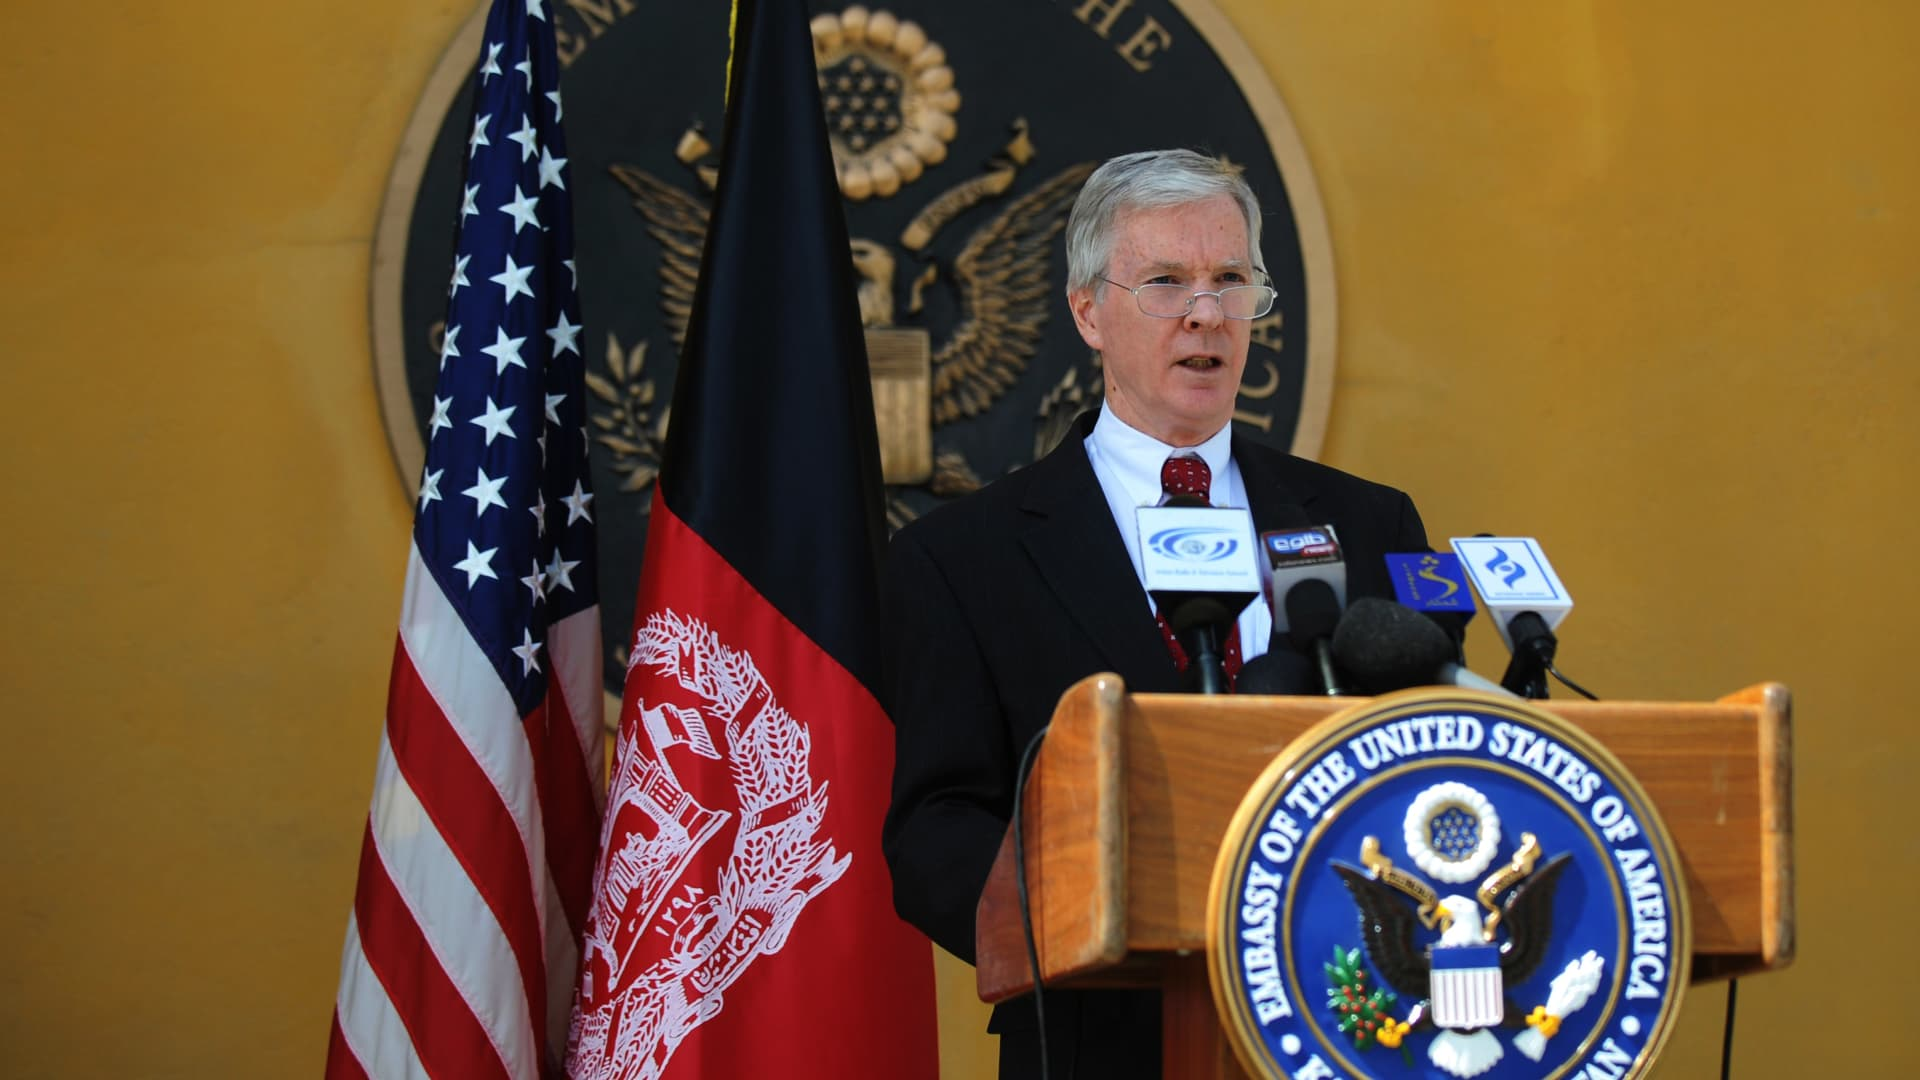 Ryan Crocker, the US Ambassador to Afghanistan speaks to journalists during a presser in Kabul on September 22, 2011.